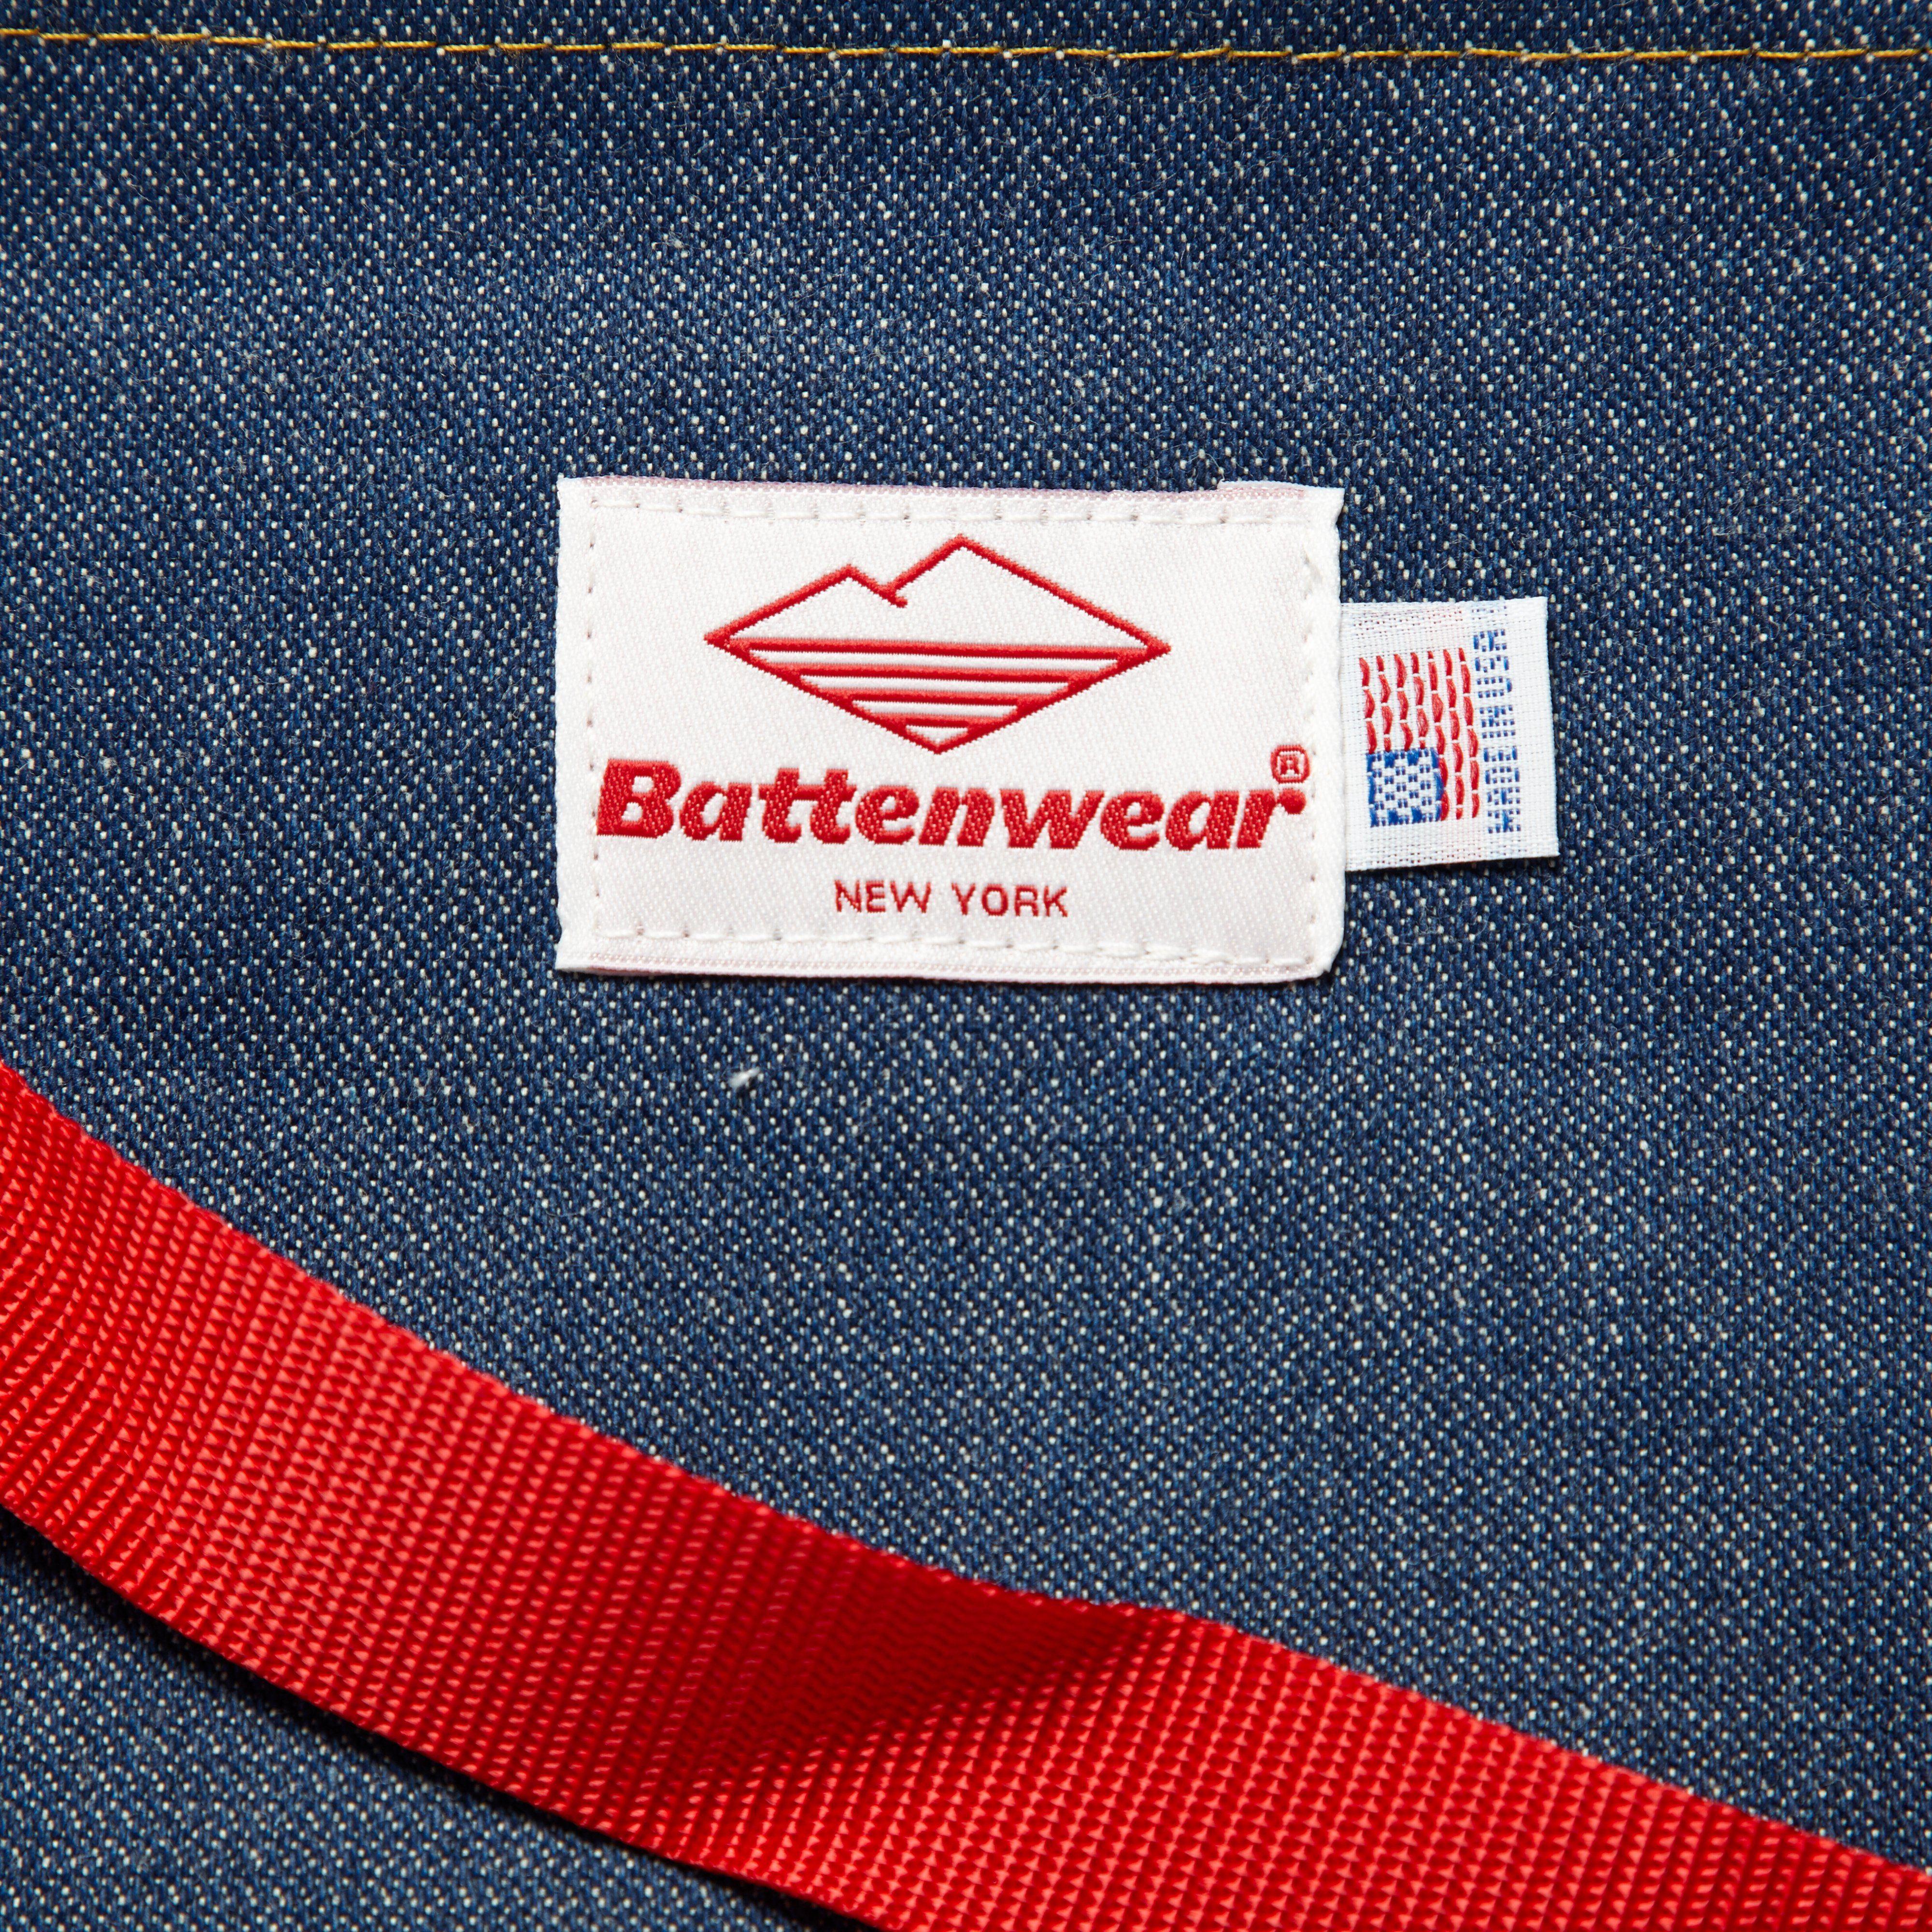 Battenwear Denim Tote